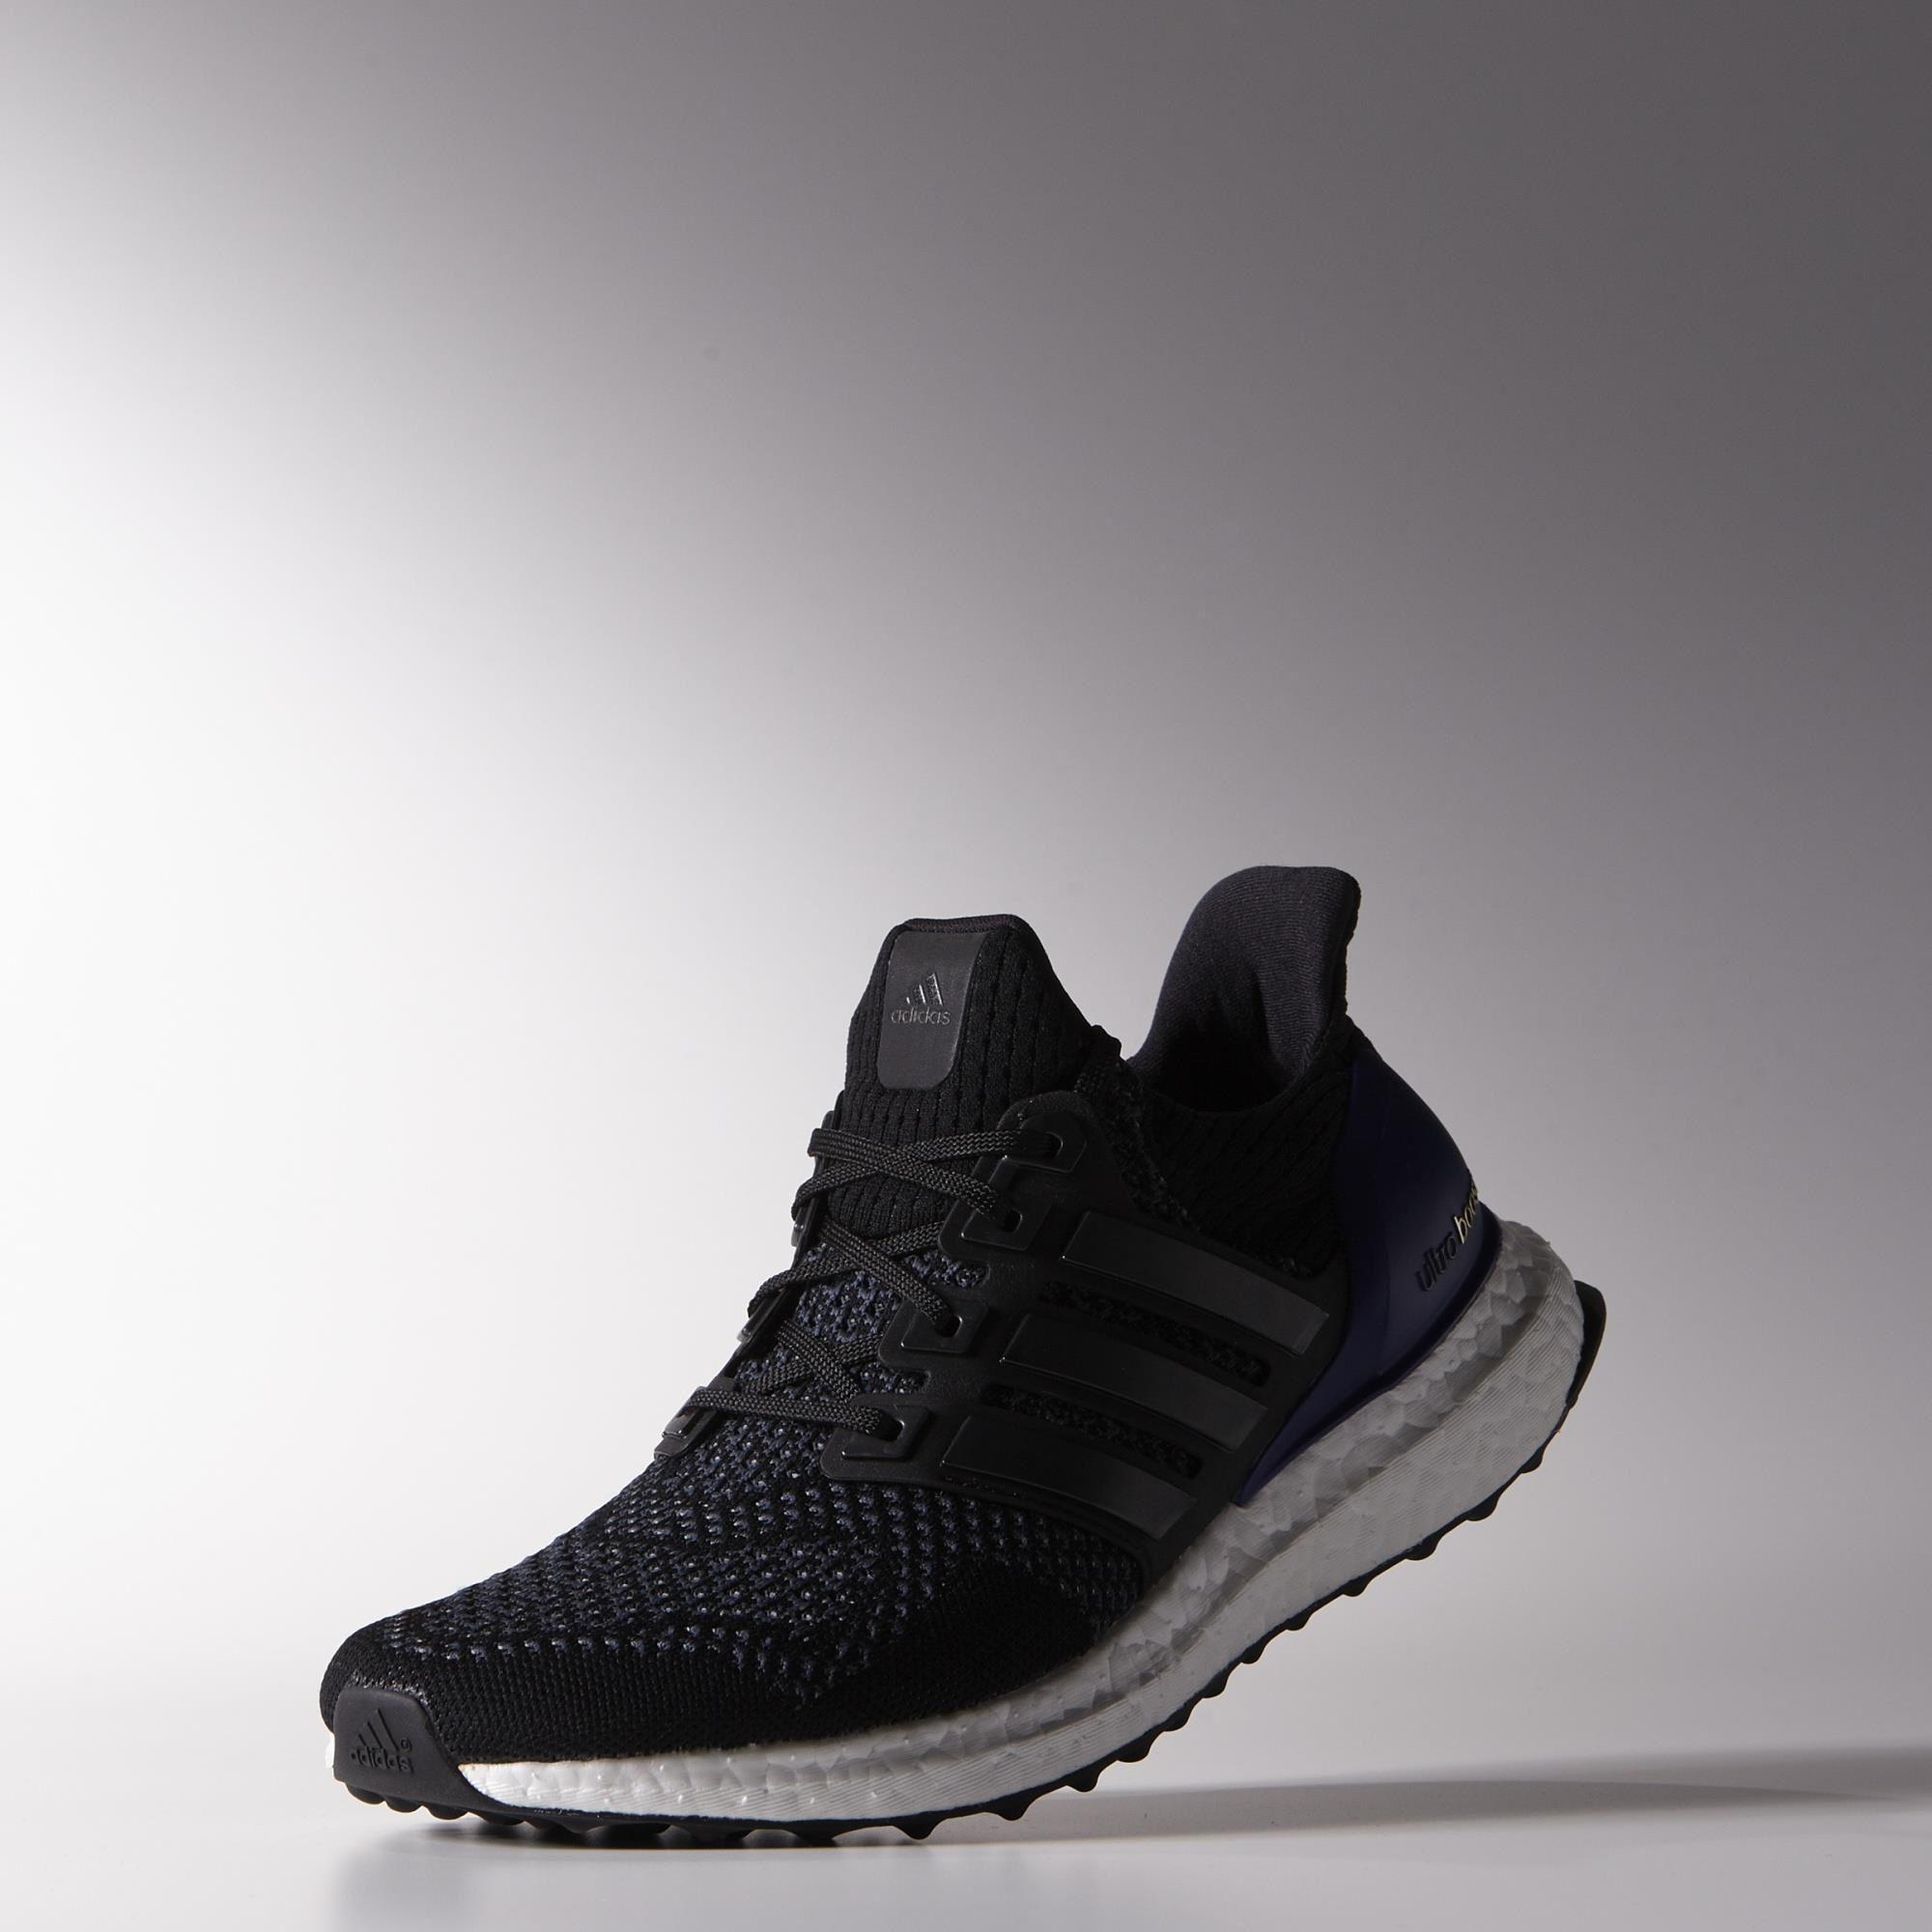 2a2a756e0 ... discount code for adidas womens ultra boost running shoes black 8b73b  c876f